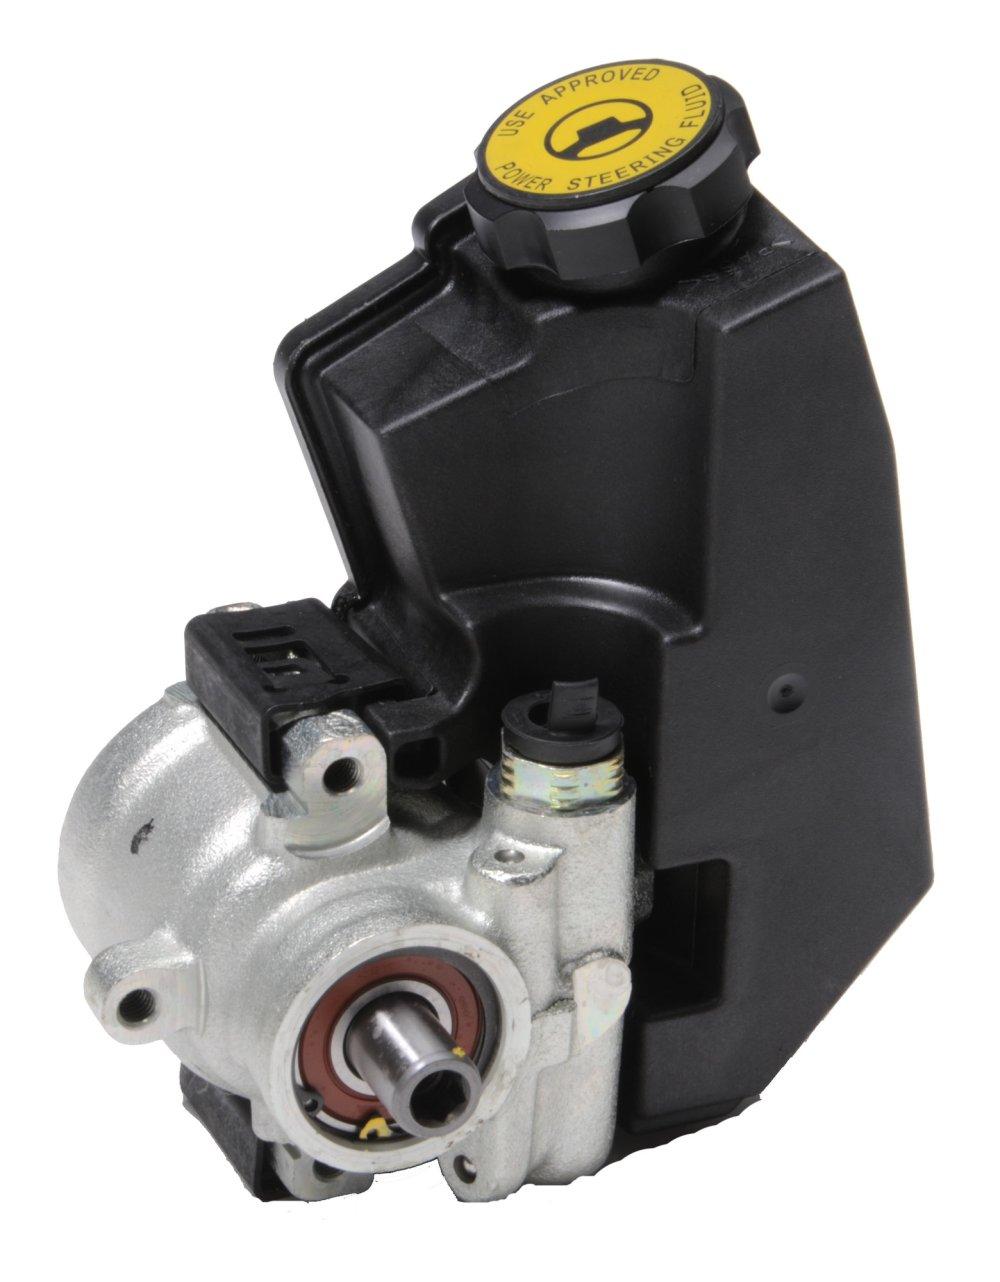 medium resolution of crown automotive power